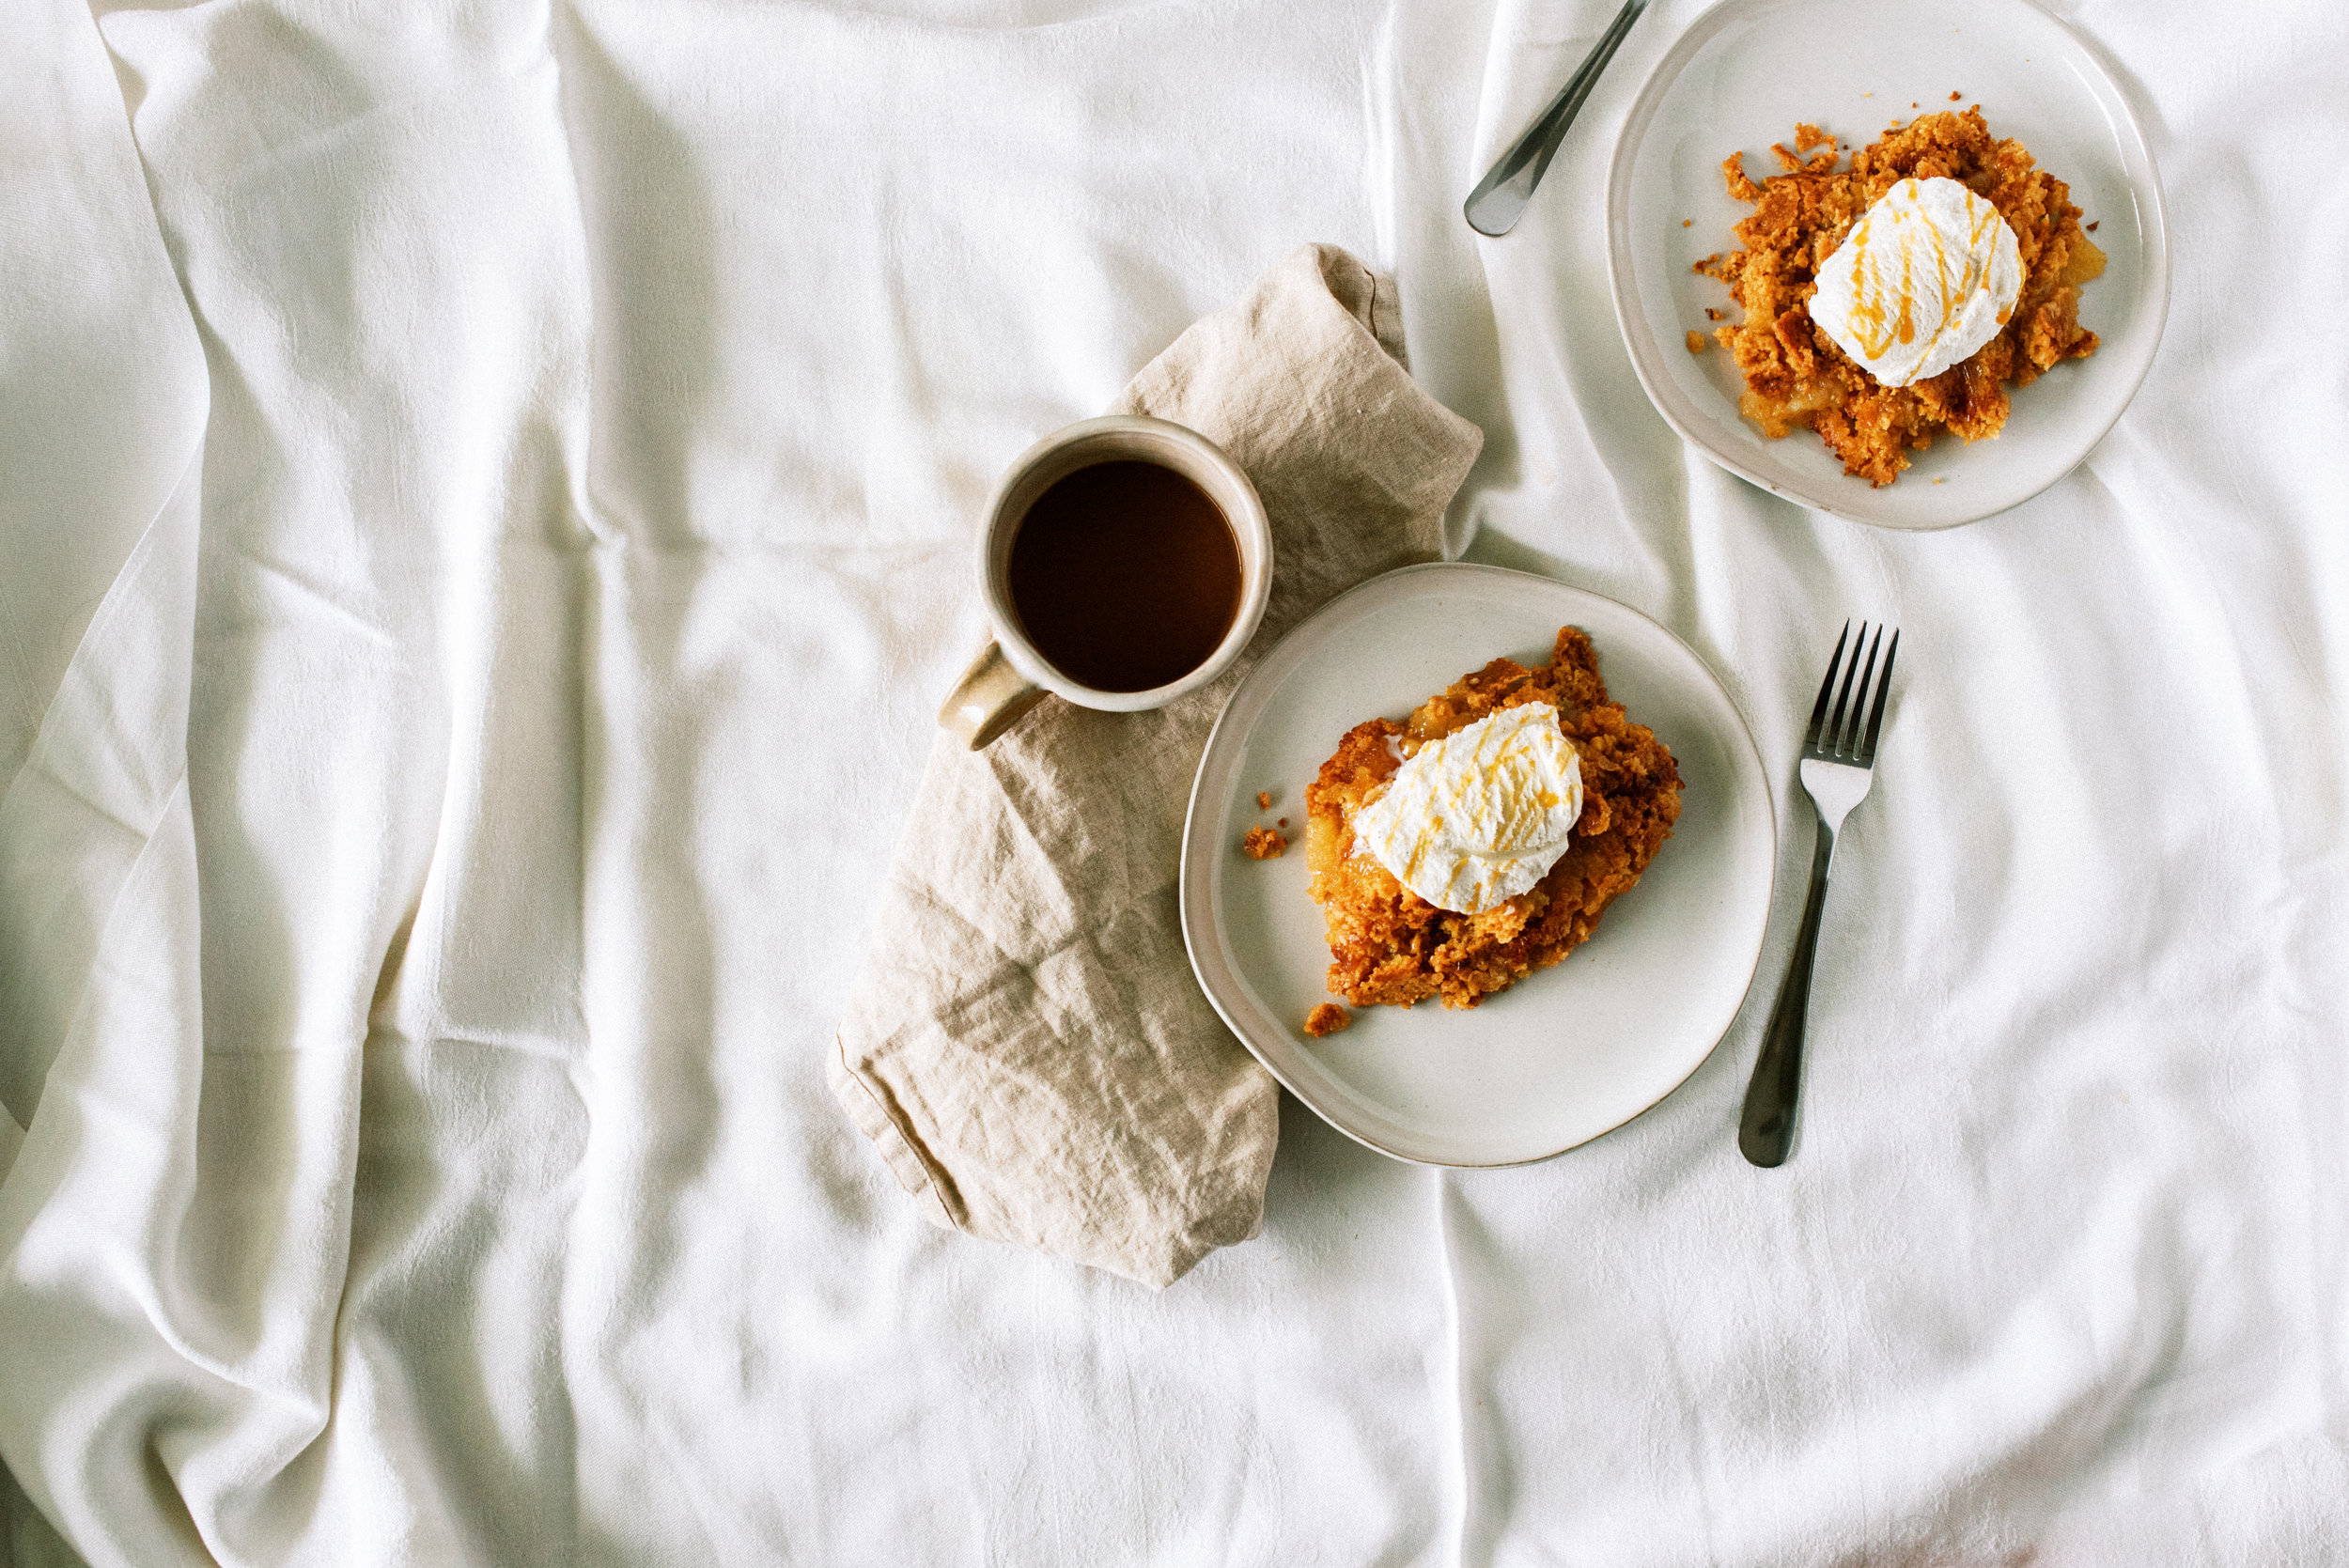 Food_Brand_Editorial_Photographer_Tonya_Espy_Photography-62.jpg